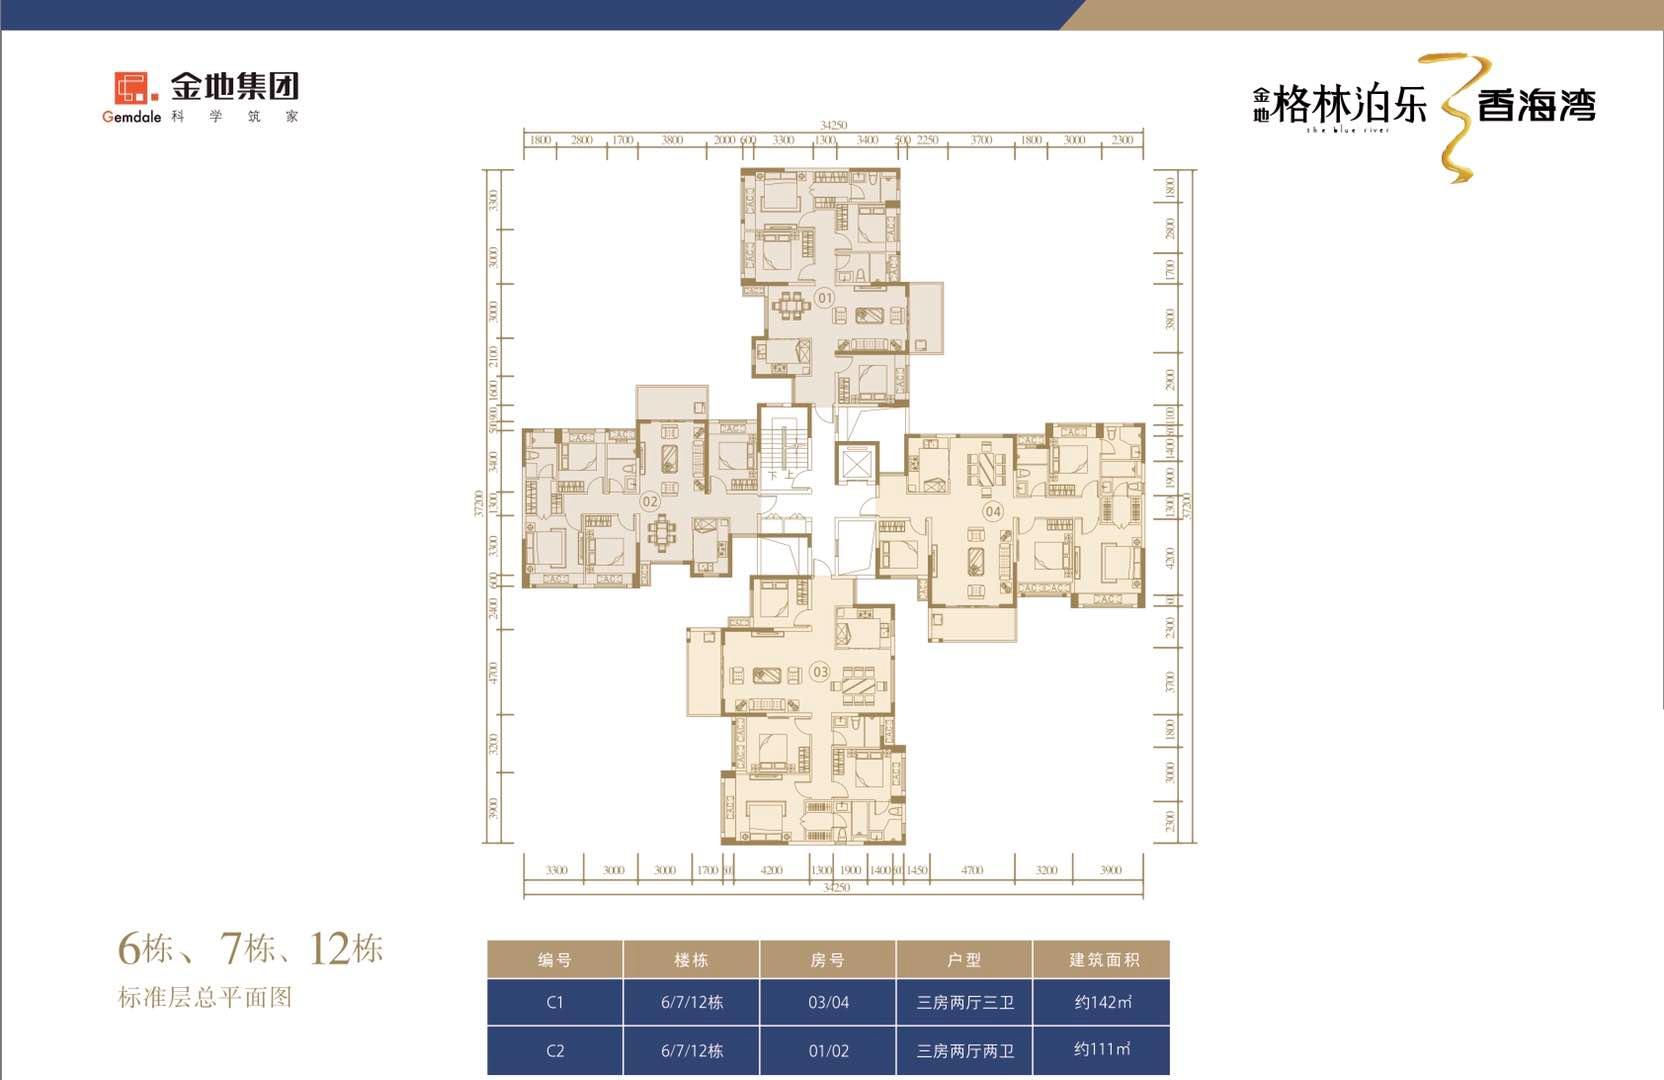 泊乐3C1&C2户型 3房2厅3卫&3房2厅2卫 建面:111㎡&142㎡